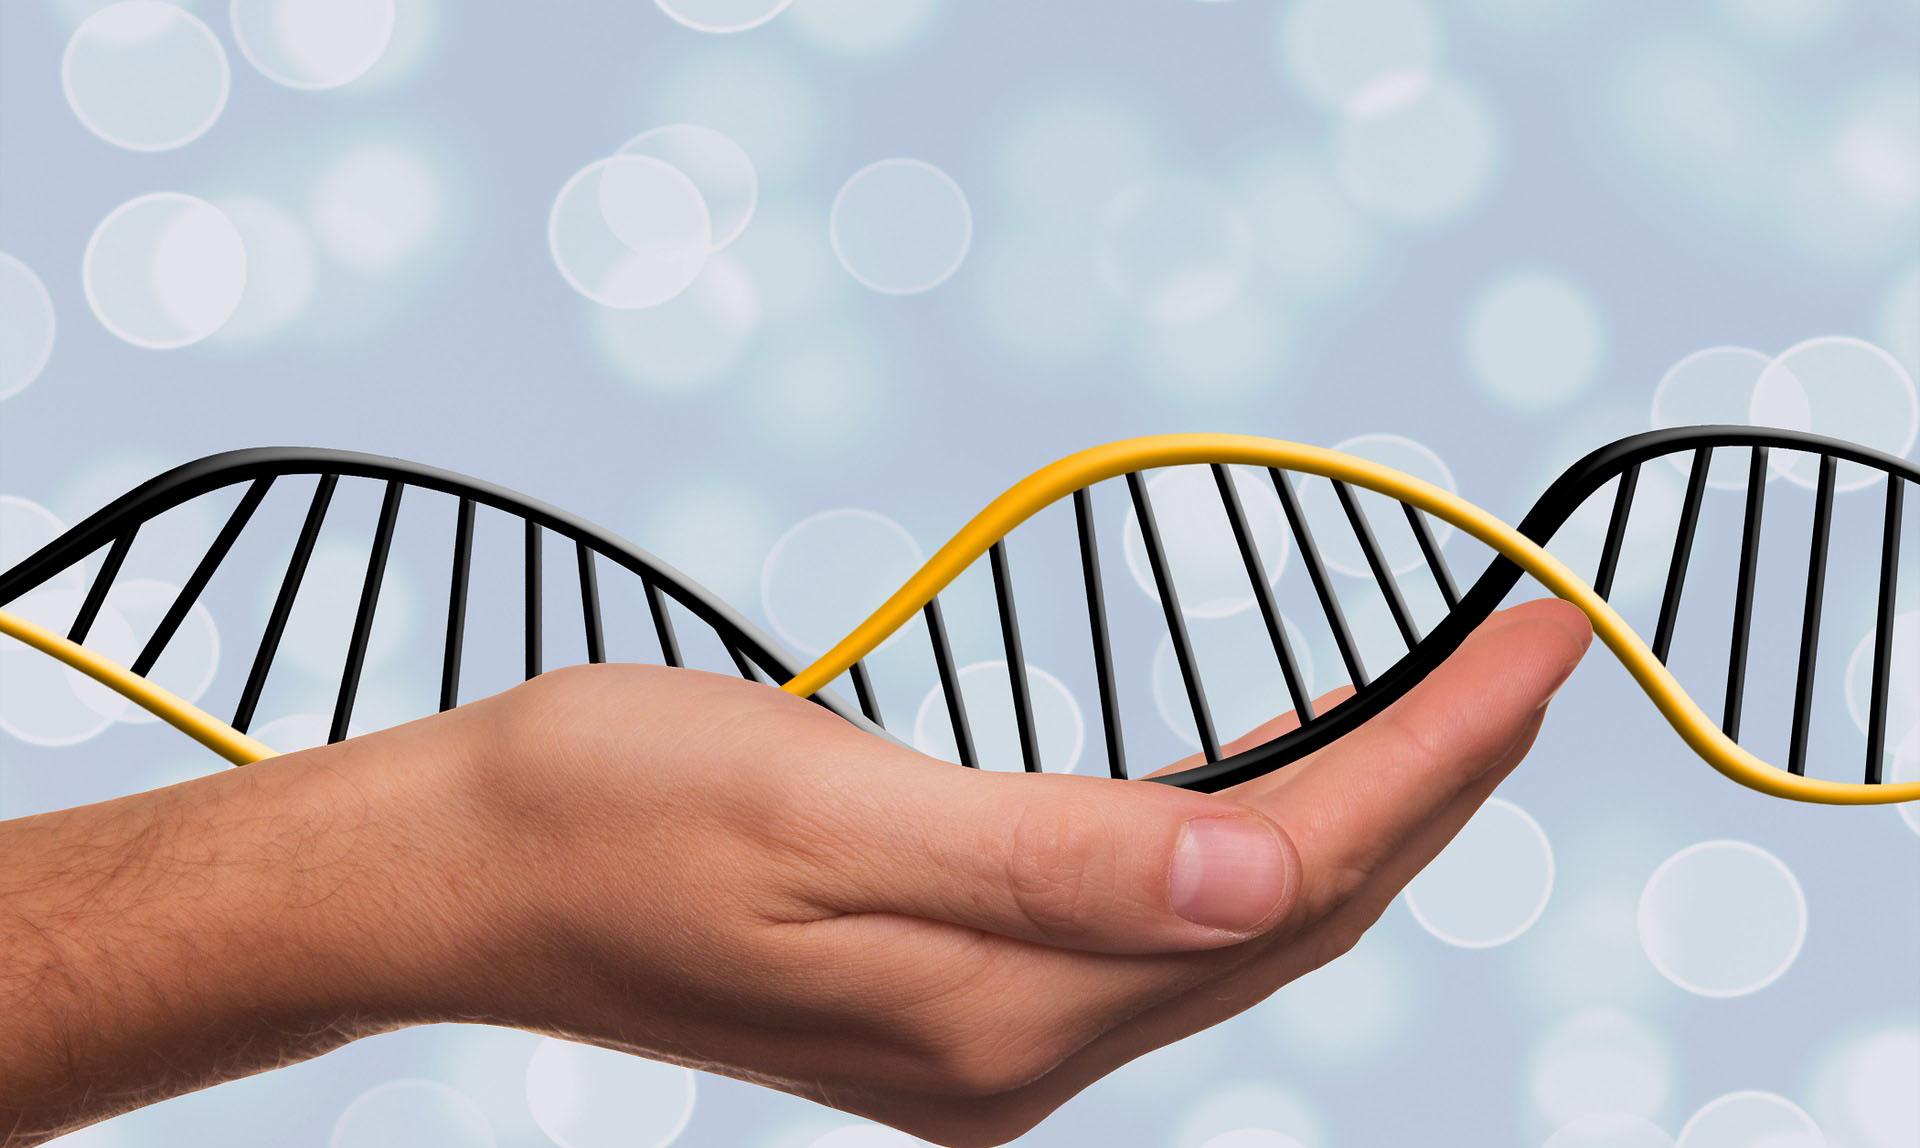 Ljudska DNK povezana s jednim davnim egzodusom iz Afrike